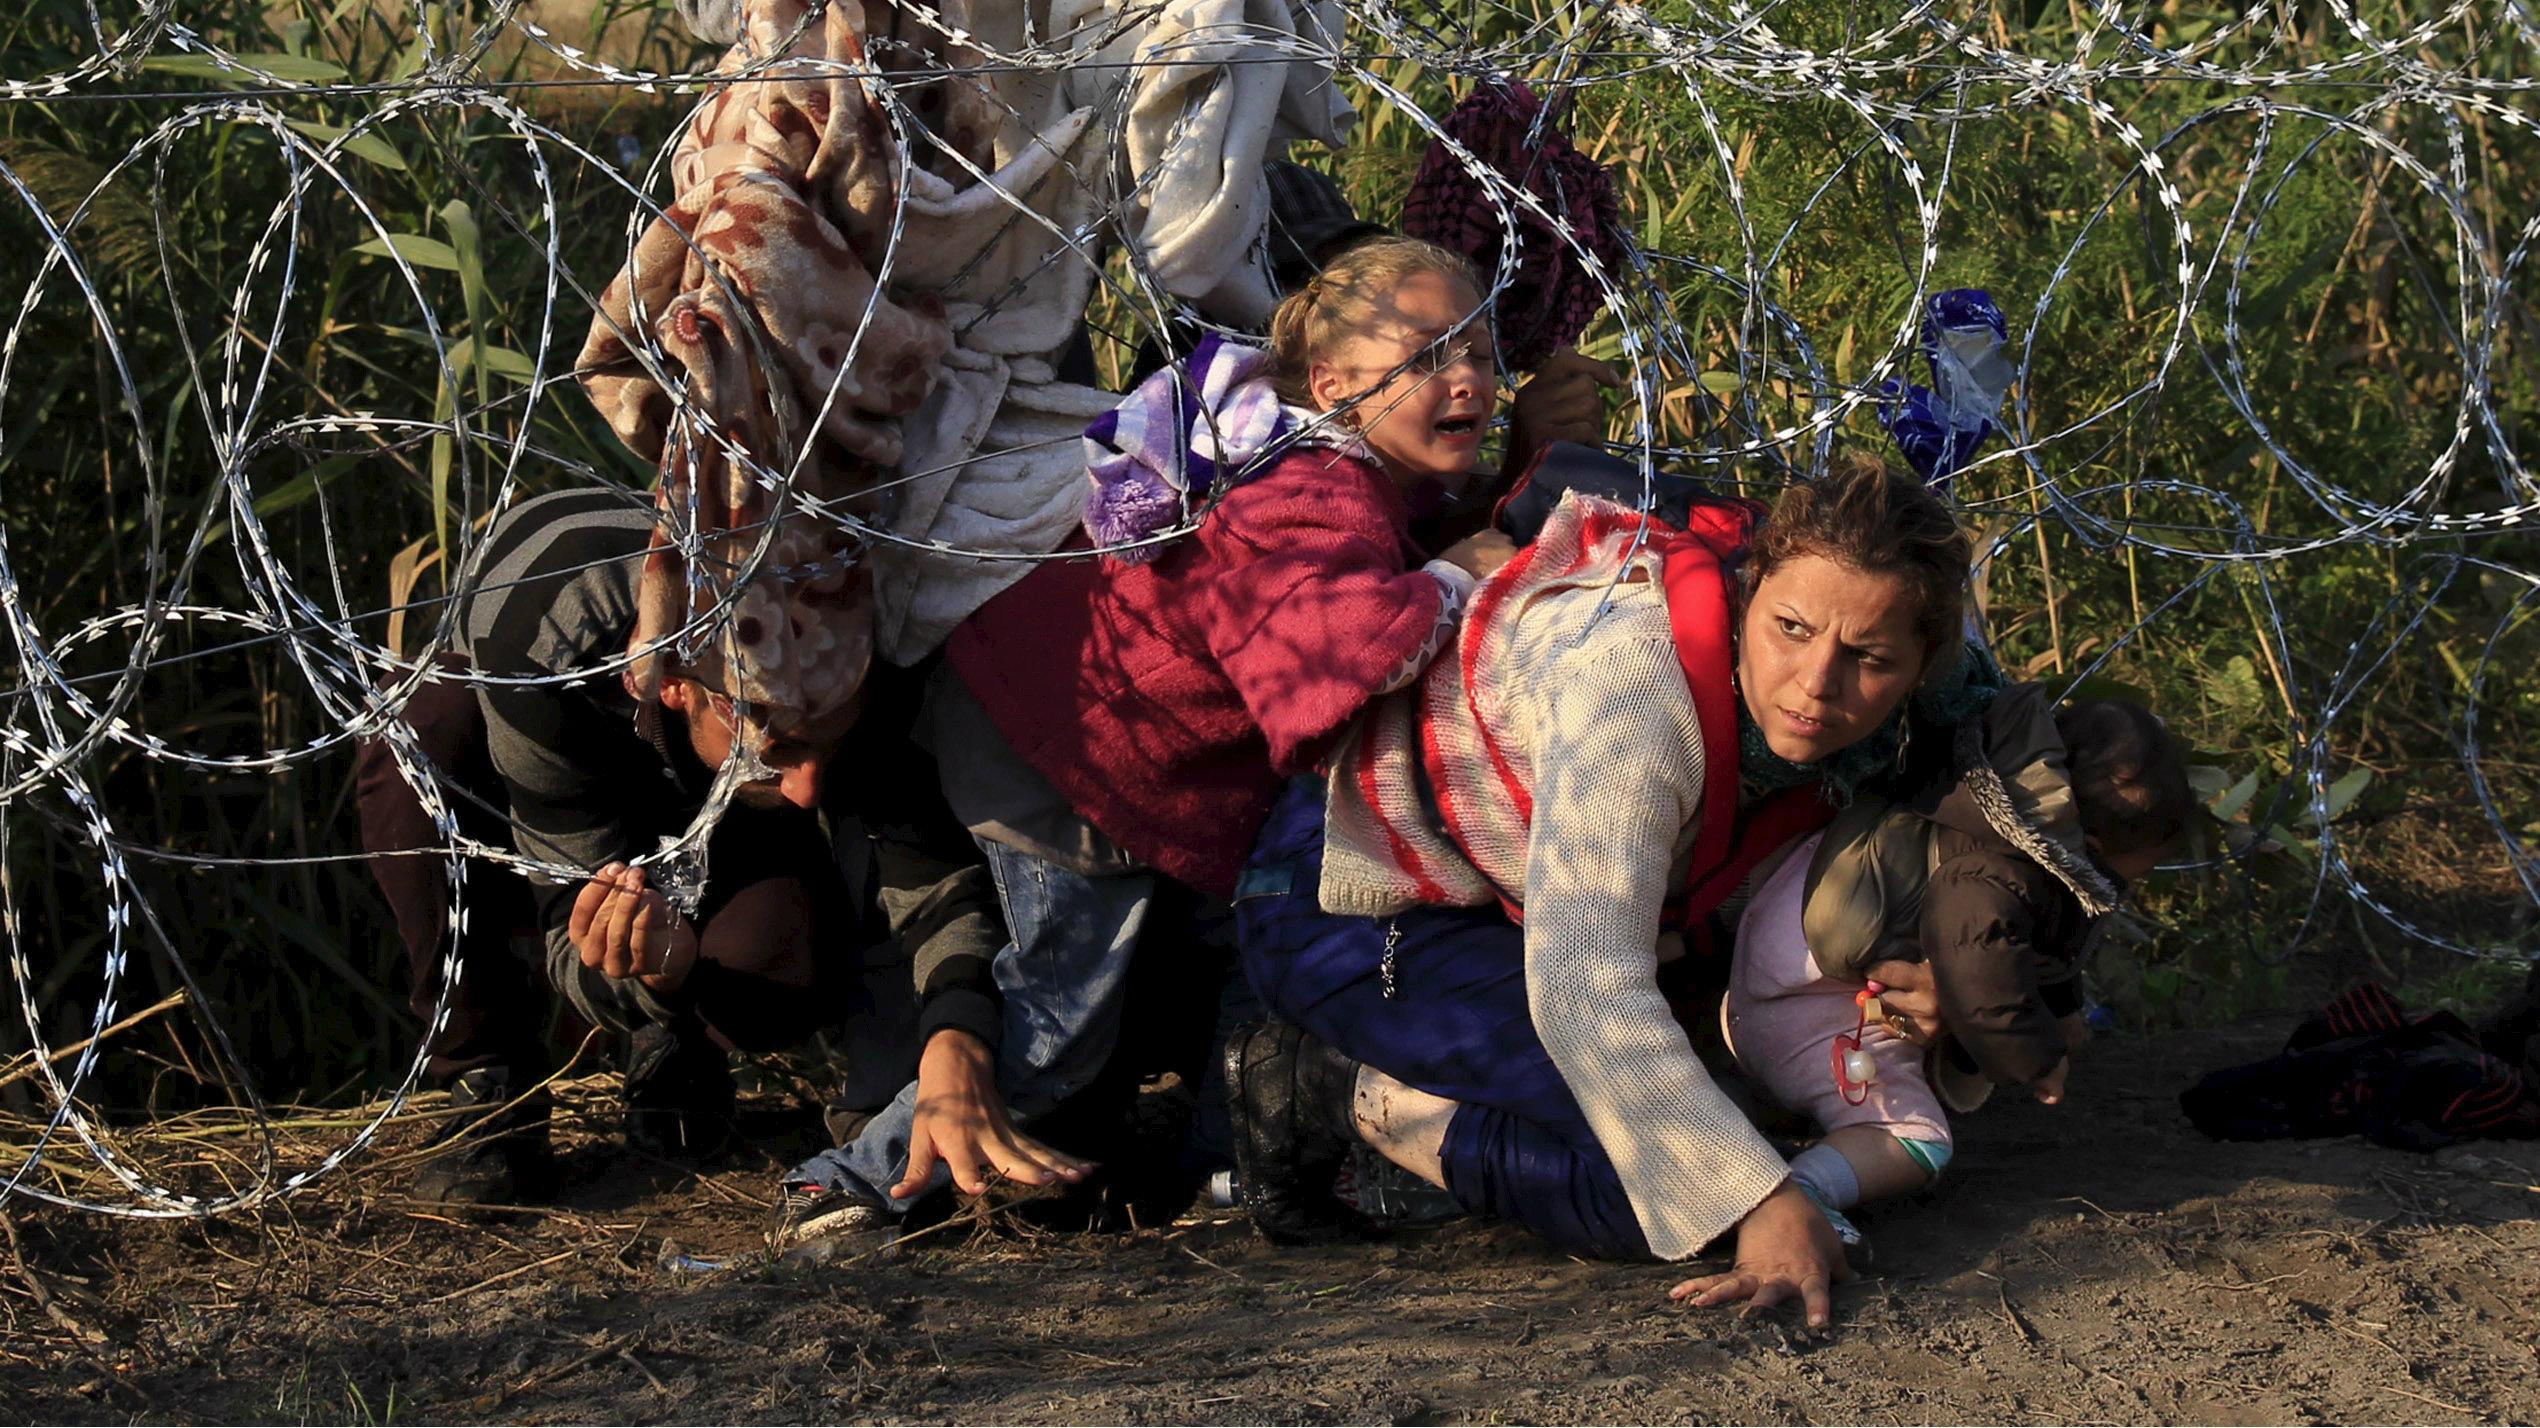 syrians crossing border fence